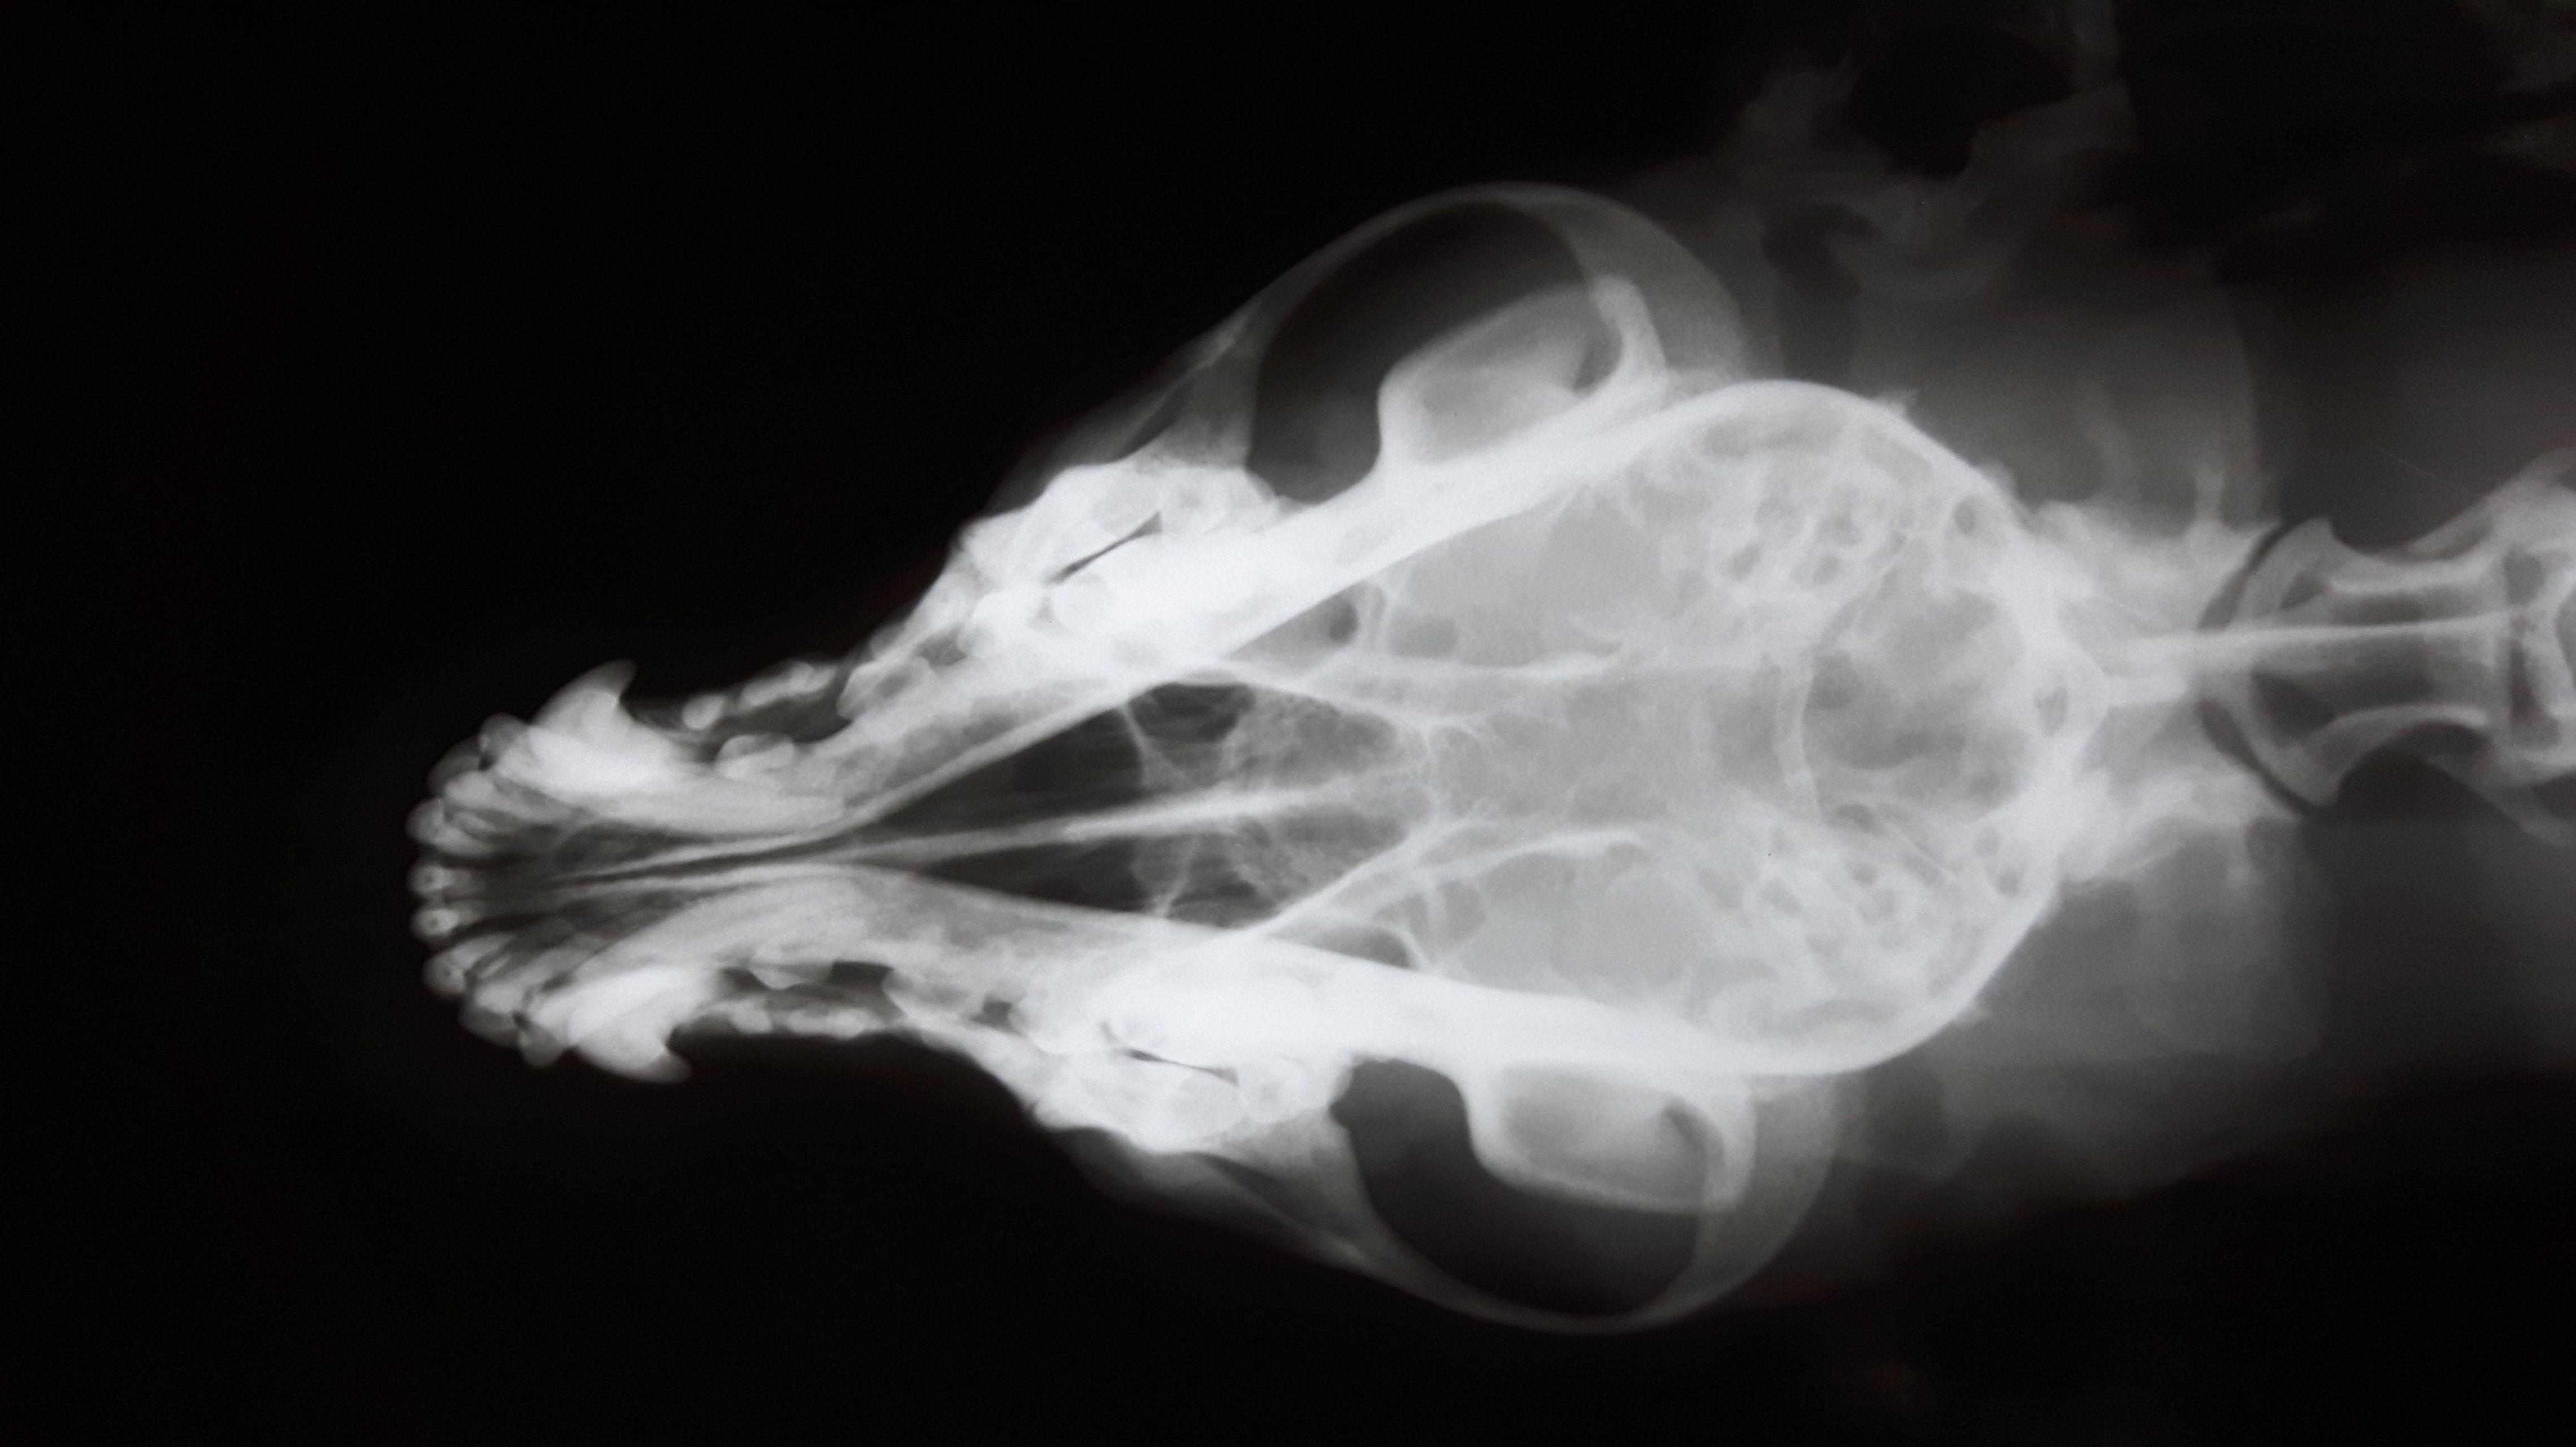 Radiología veterinaria clínica Argos Hortaleza - Canillas